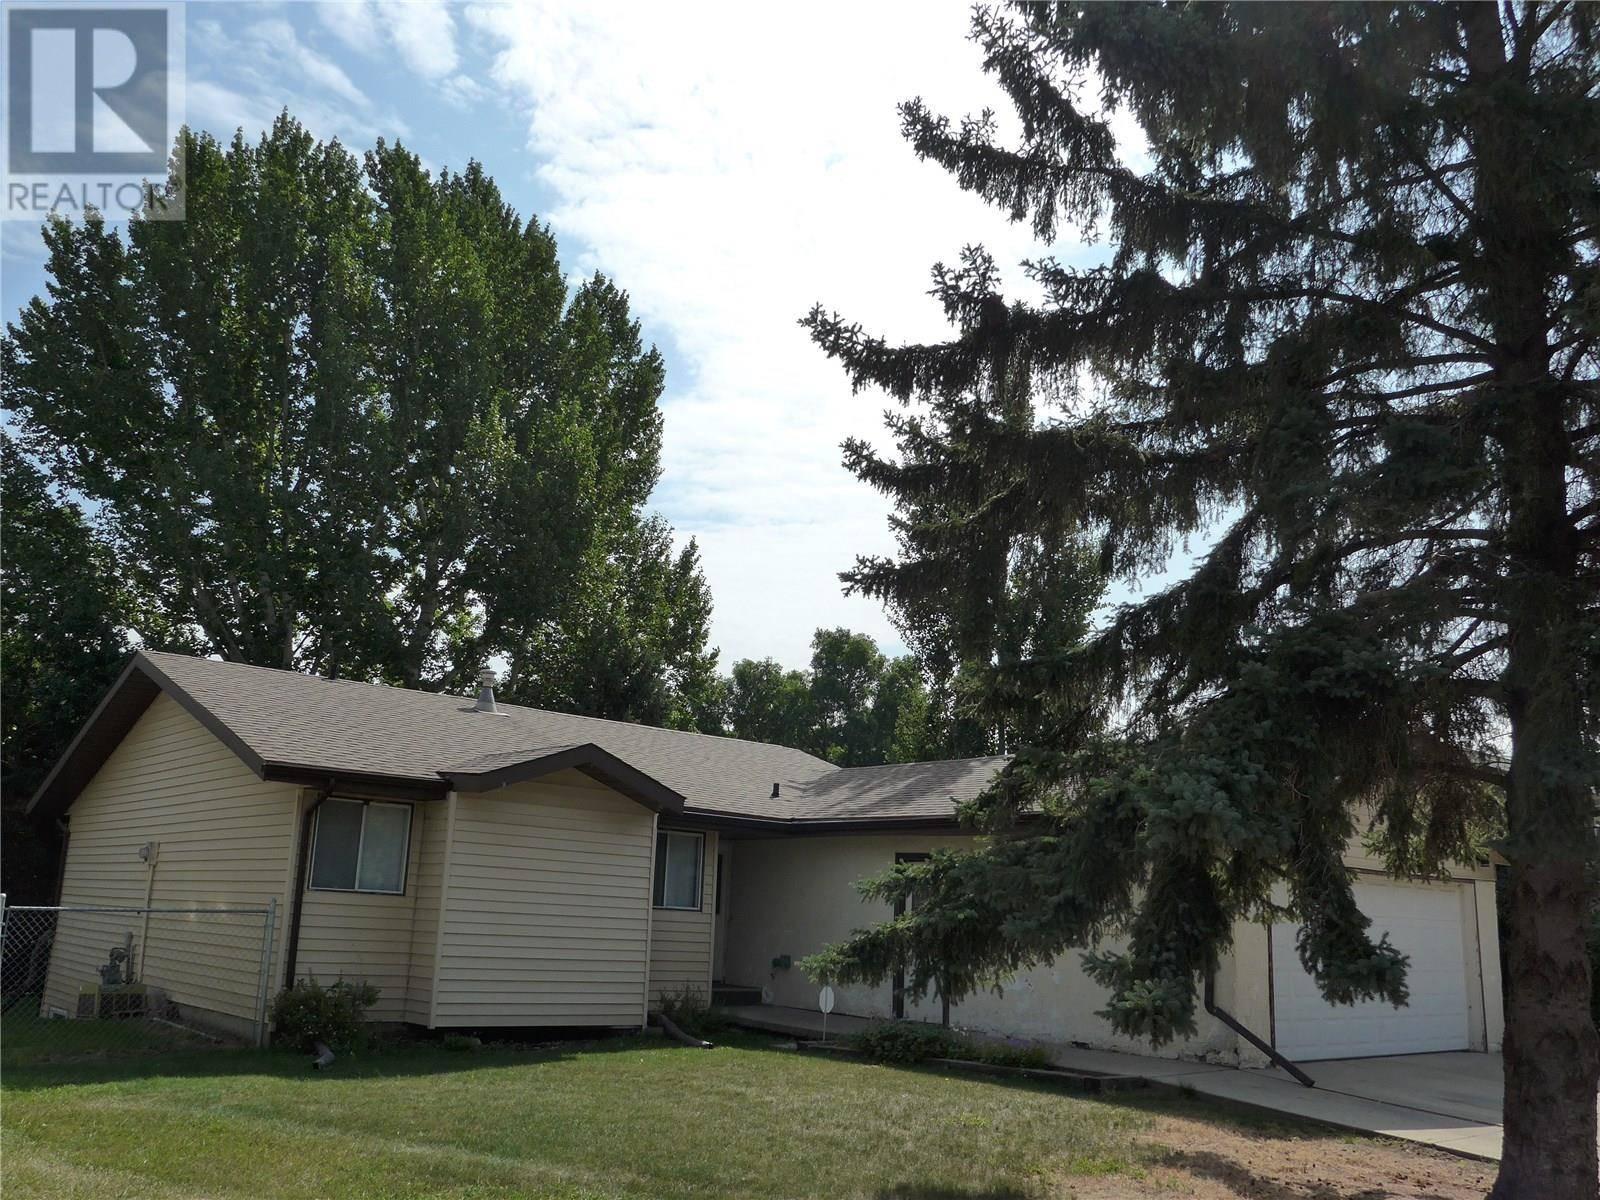 House for sale at 142 Stone Ter  Saskatoon Saskatchewan - MLS: SK783833